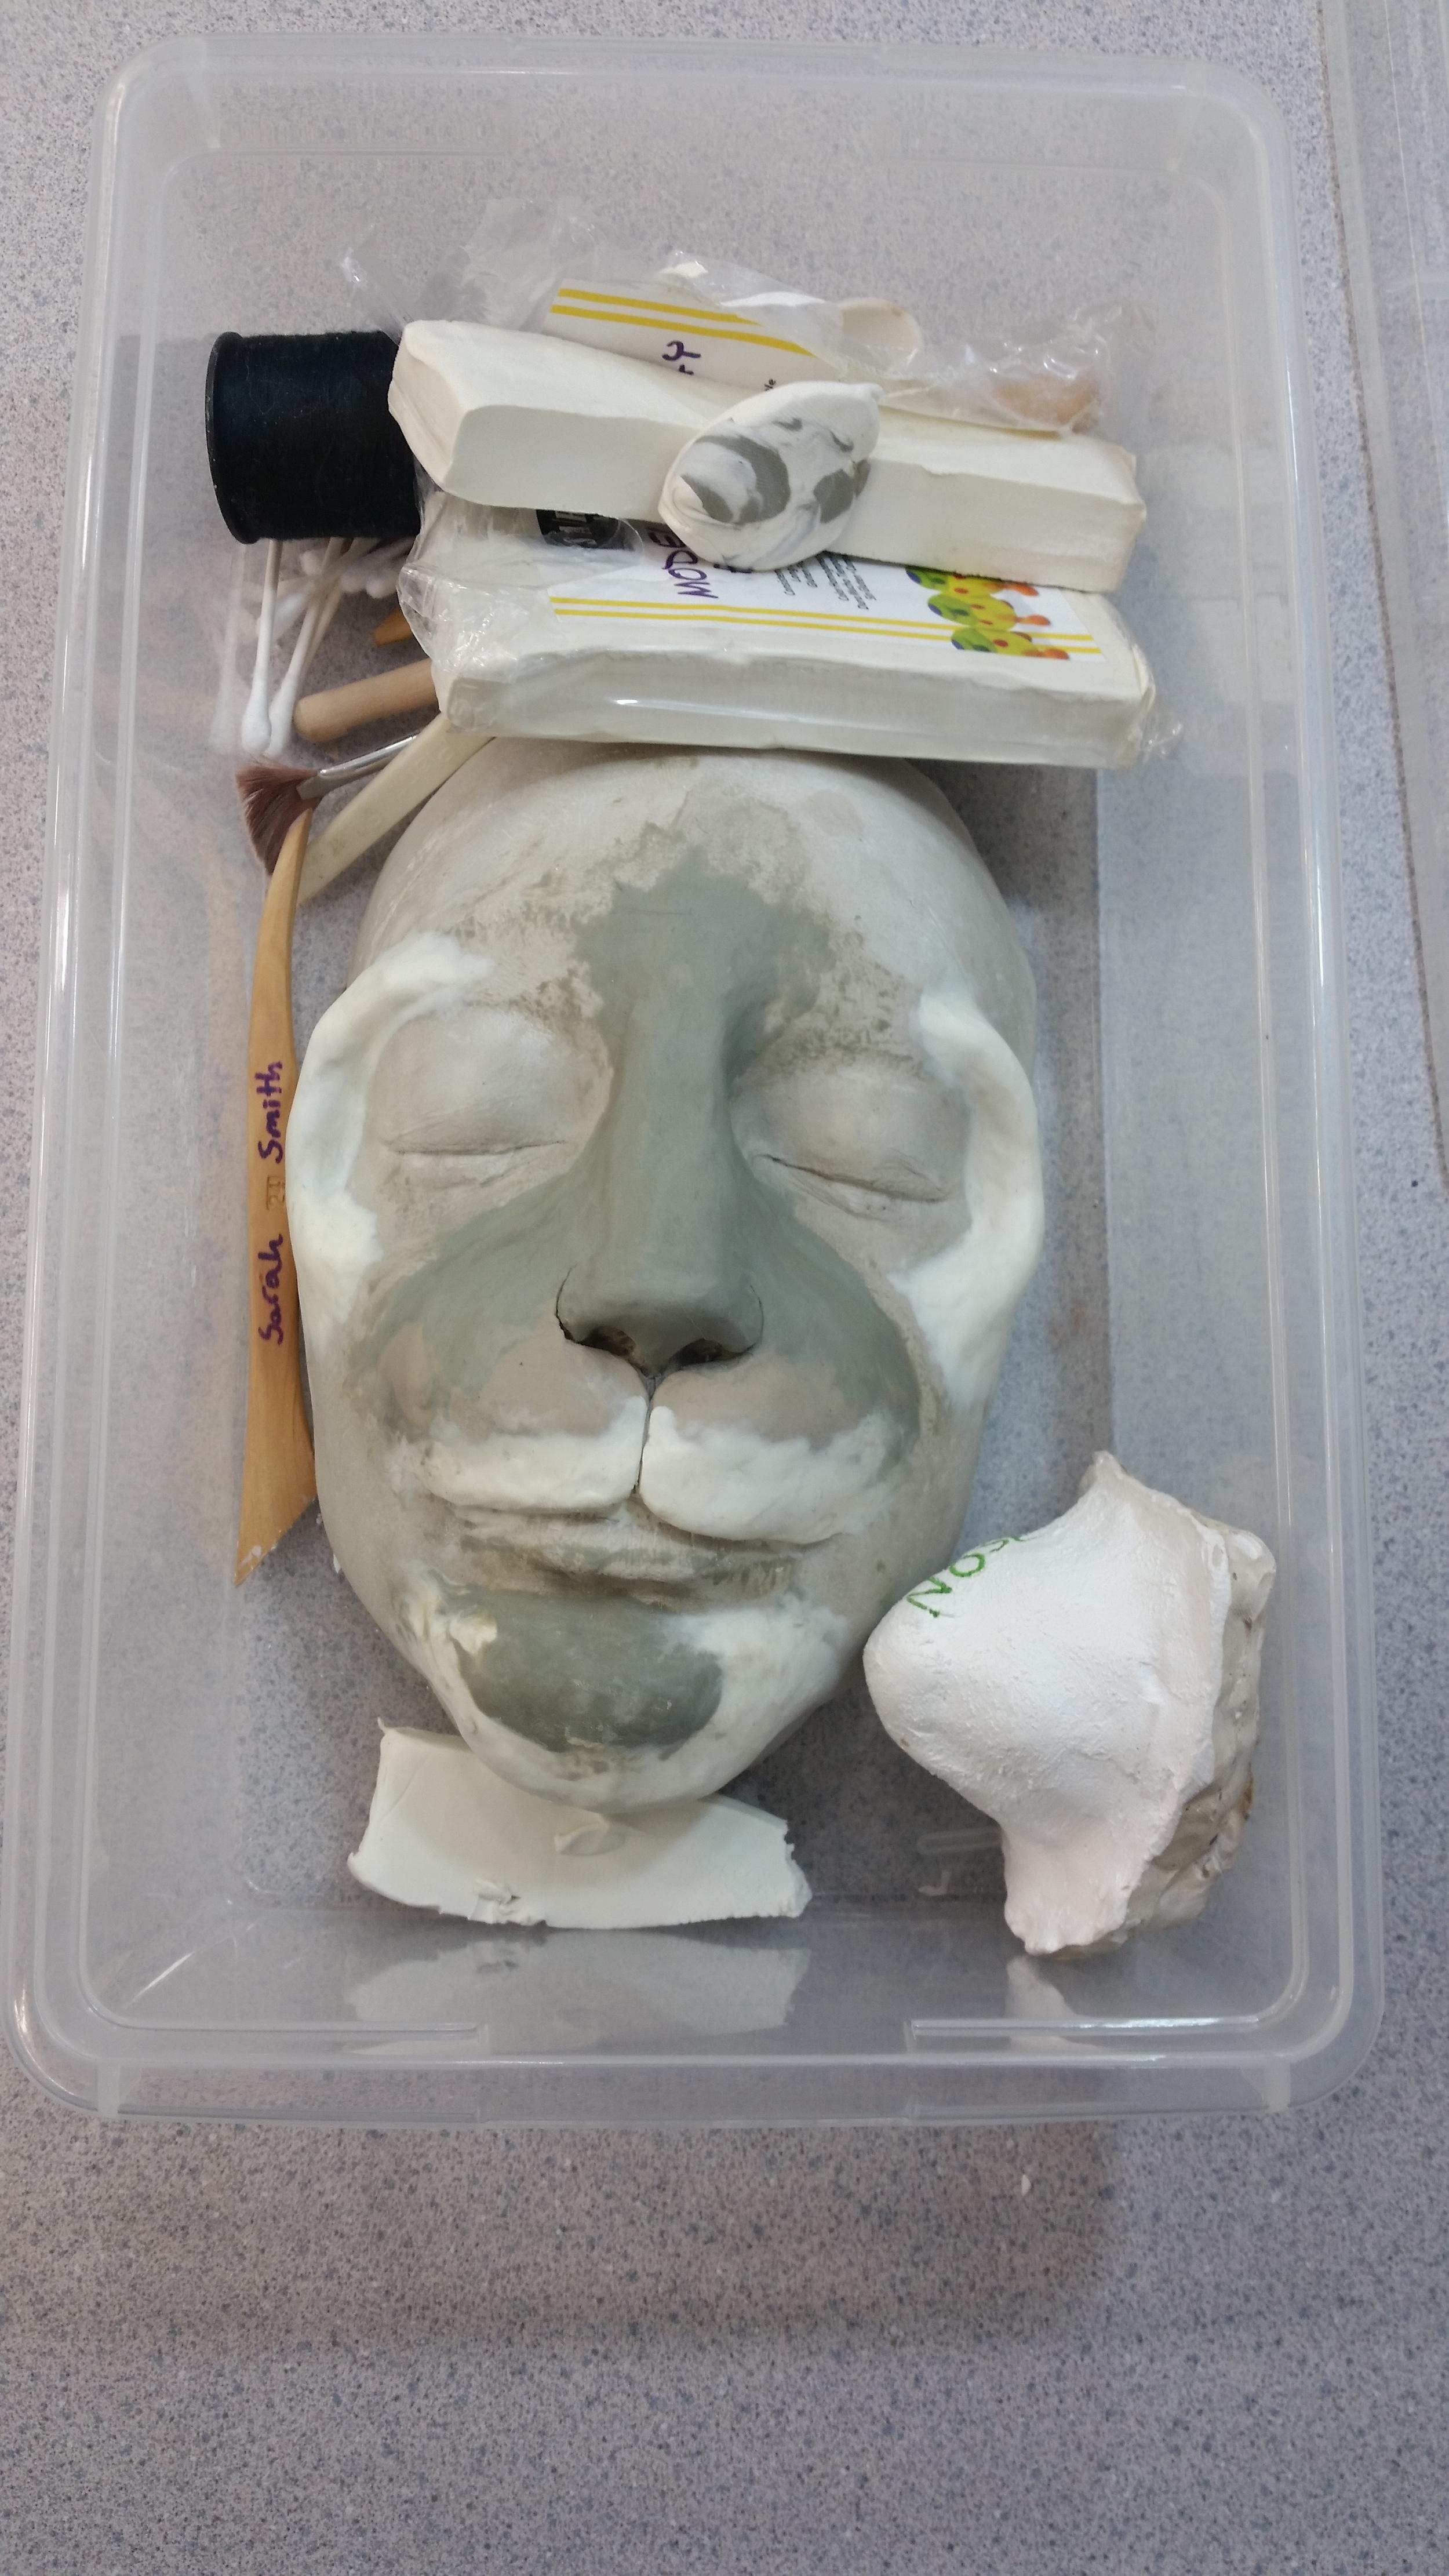 plastecine building on plaster face cast